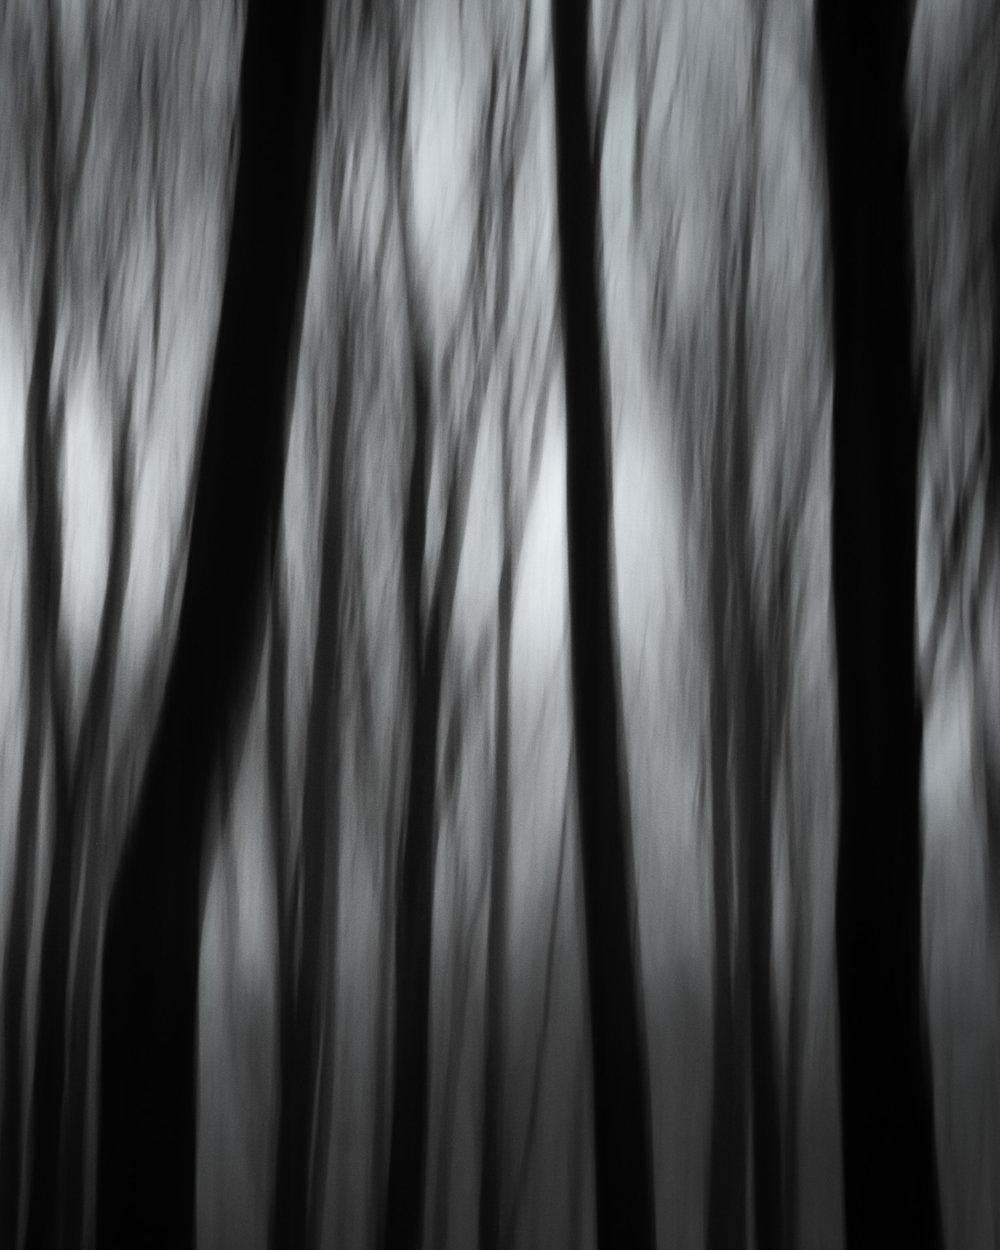 sankt olof tree coliur fog 5.jpg